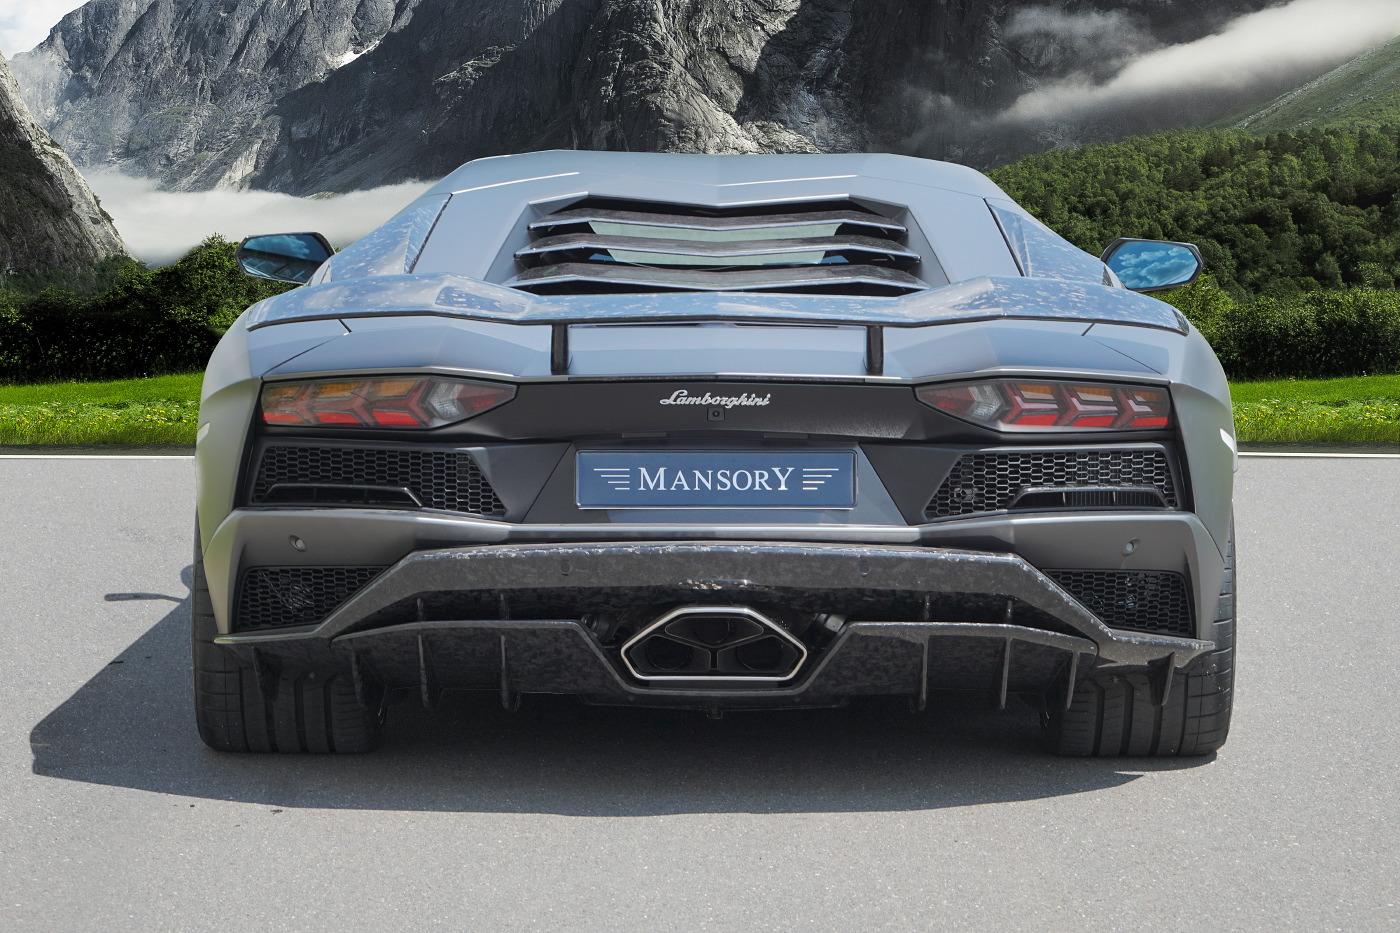 Mansory Lamborghini Aventador S Rear View